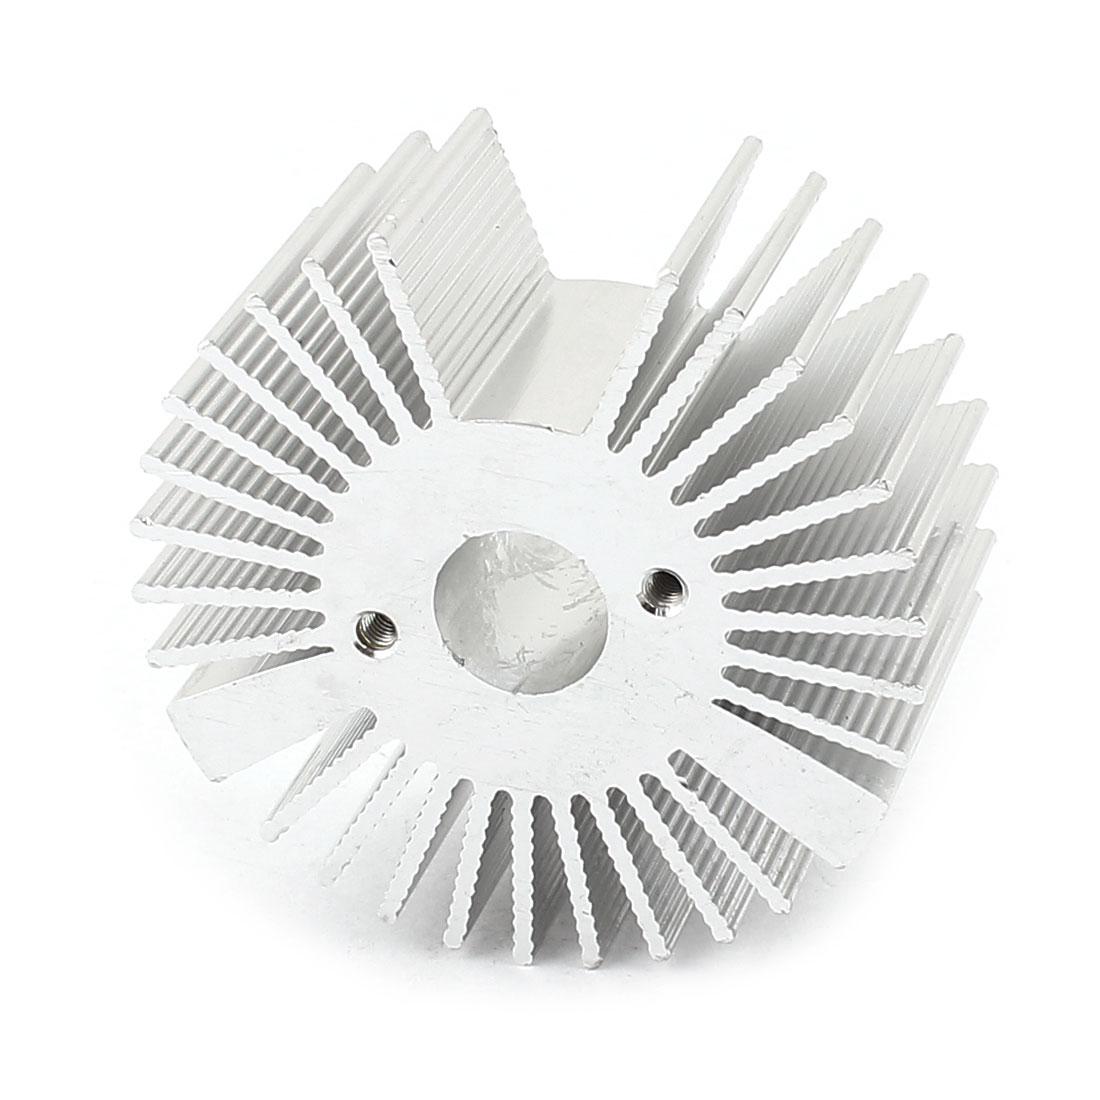 50mm x 22mm Sunflower 3W Power LED Light Heatsink Aluminium Cooling Fin